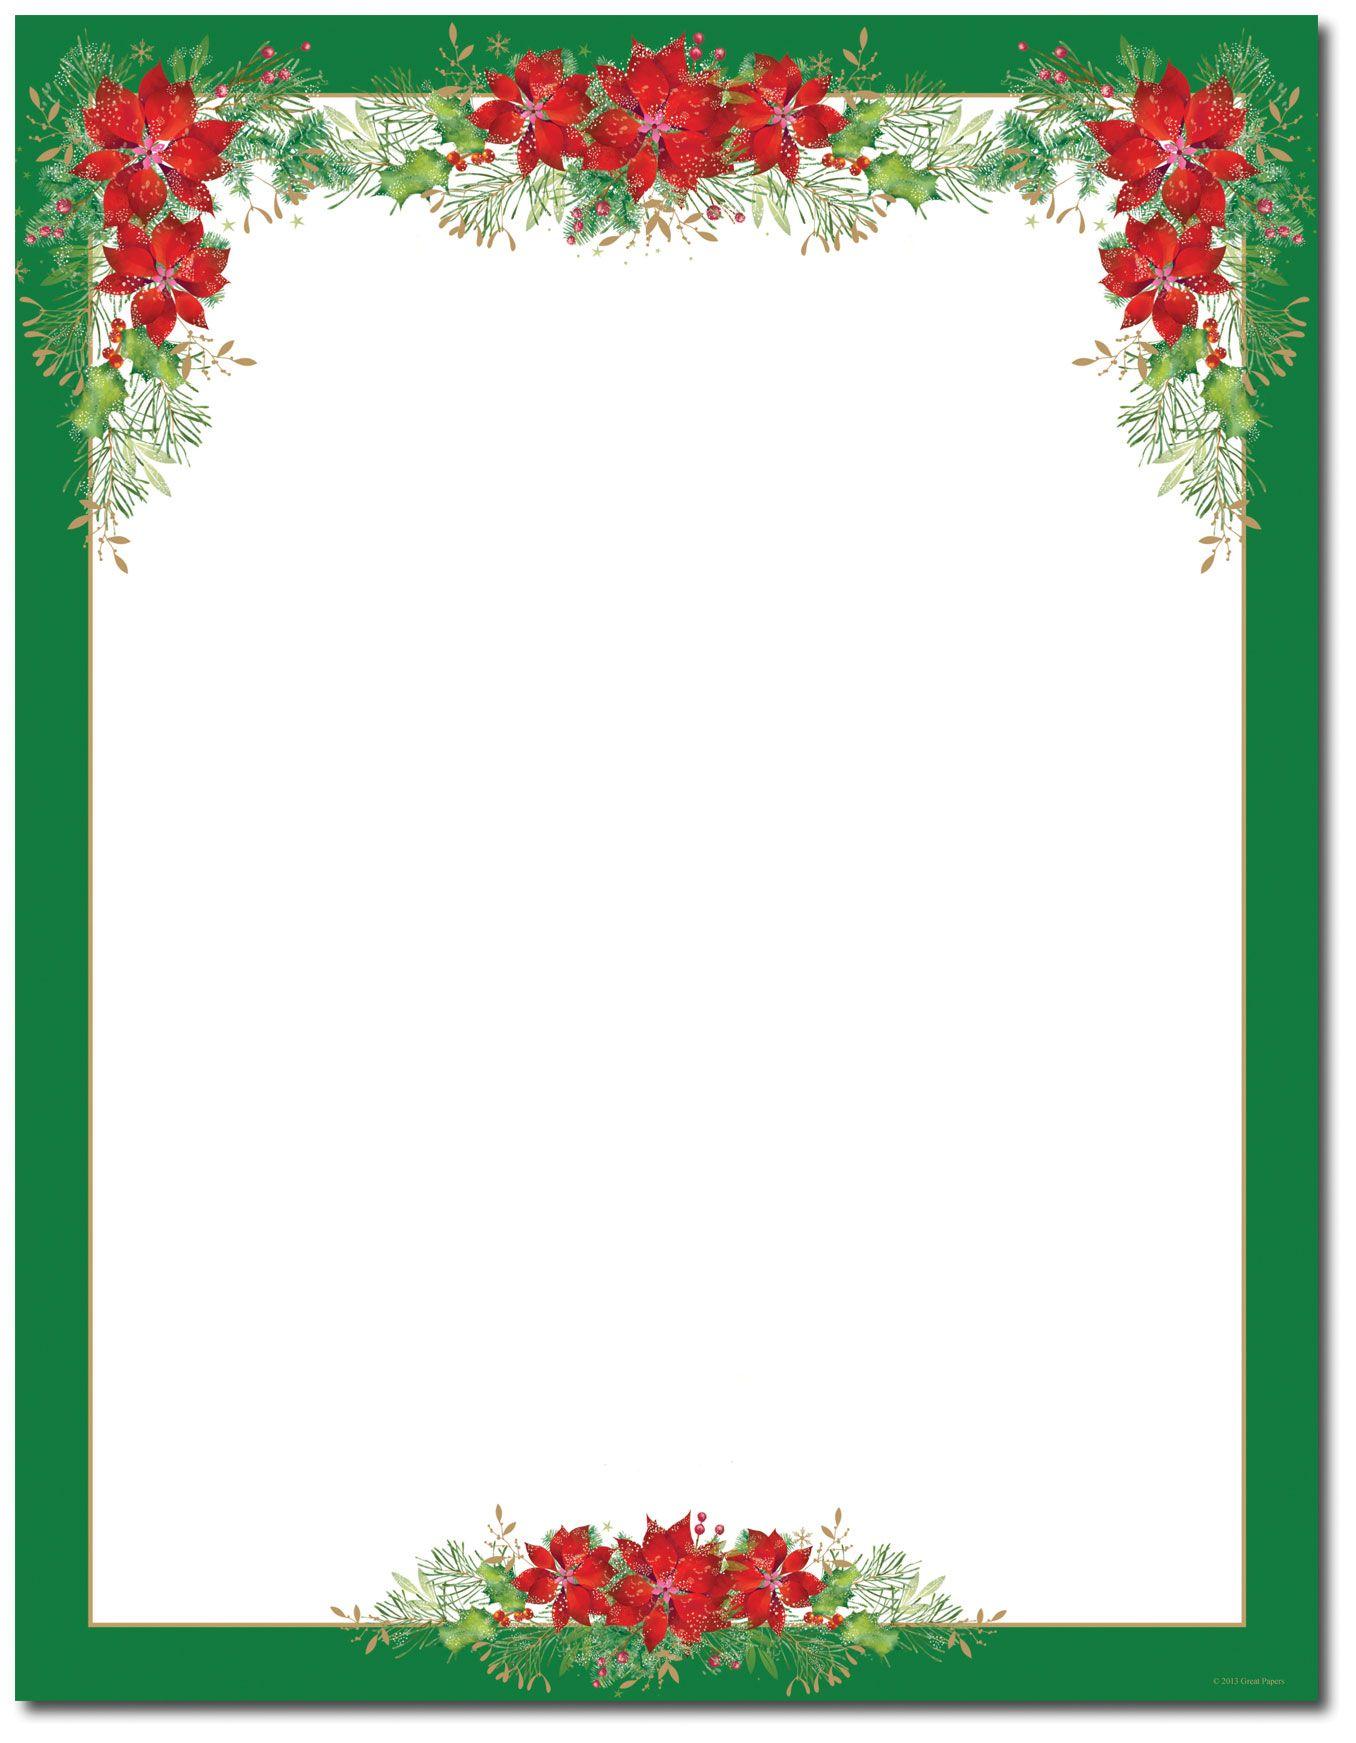 Free christmas poinsettia border clipart image free download Poinsettia Valance Letterhead | Holiday Papers | Christmas border ... image free download